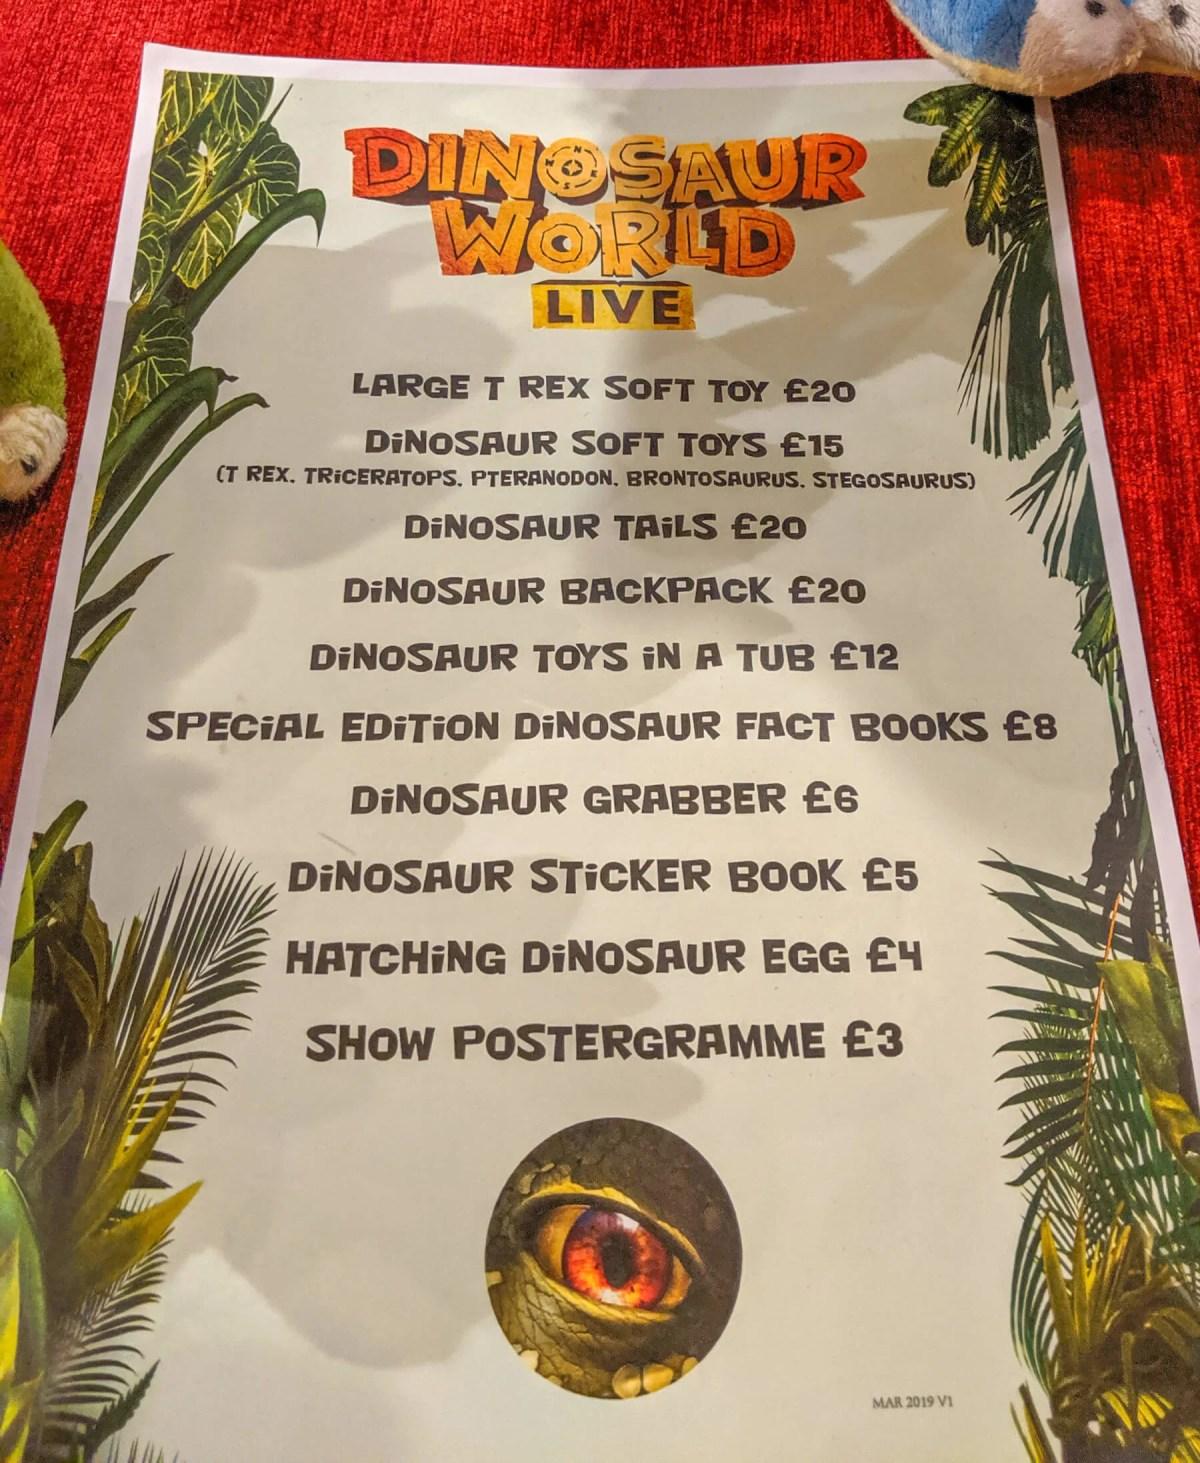 price list of merchandise at Dinosaur World Live